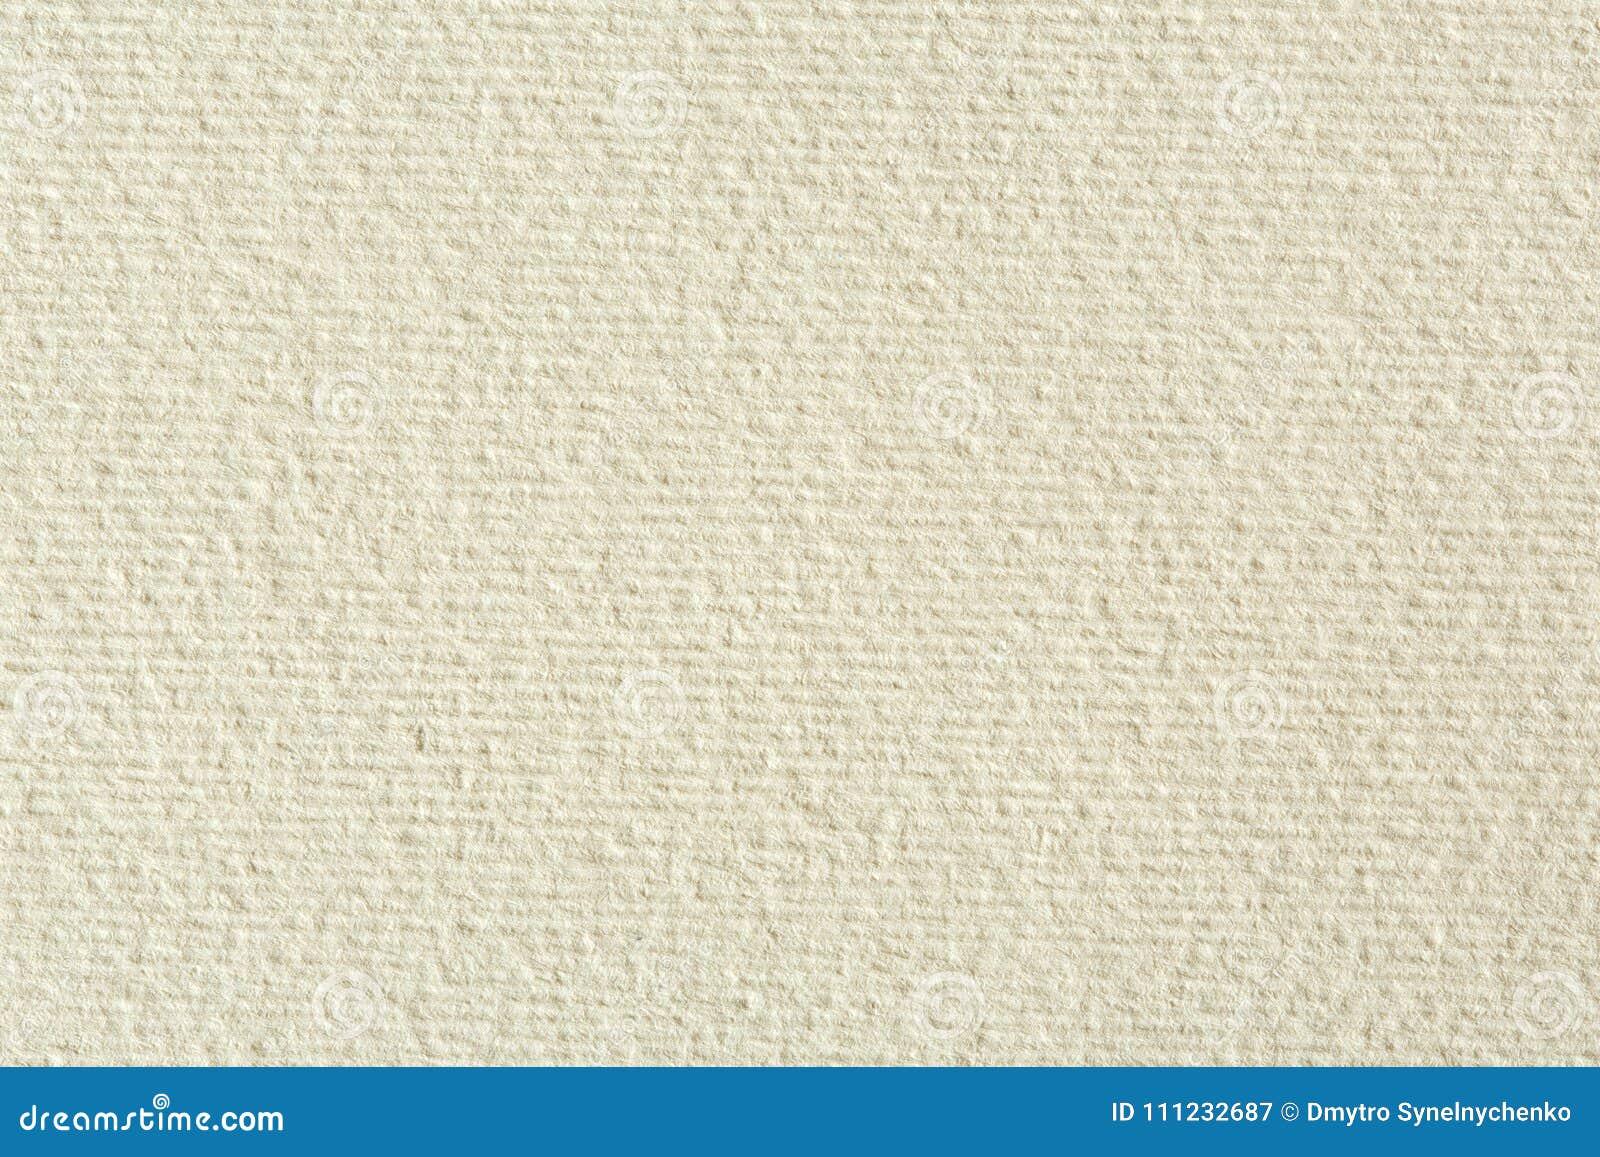 Cream Textured Paper Stock Image Of Blank Grunge